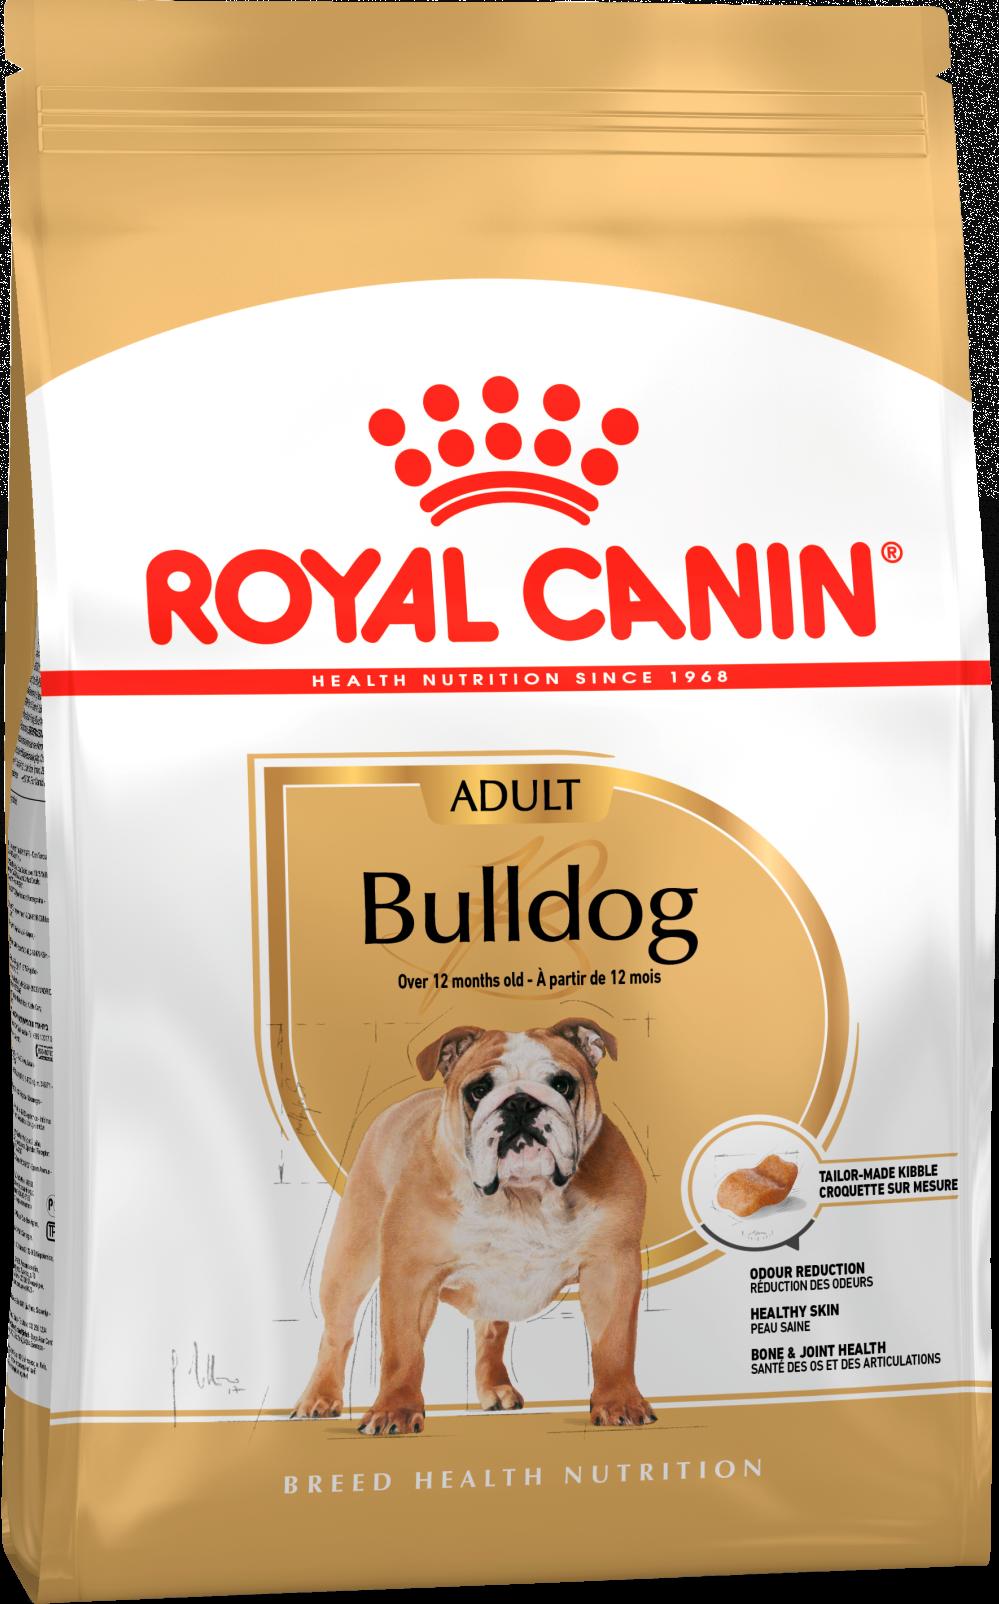 Royal Canin Корм для взрослых собак породы английский бульдог, Royal Canin Bulldog Adult 345030.png